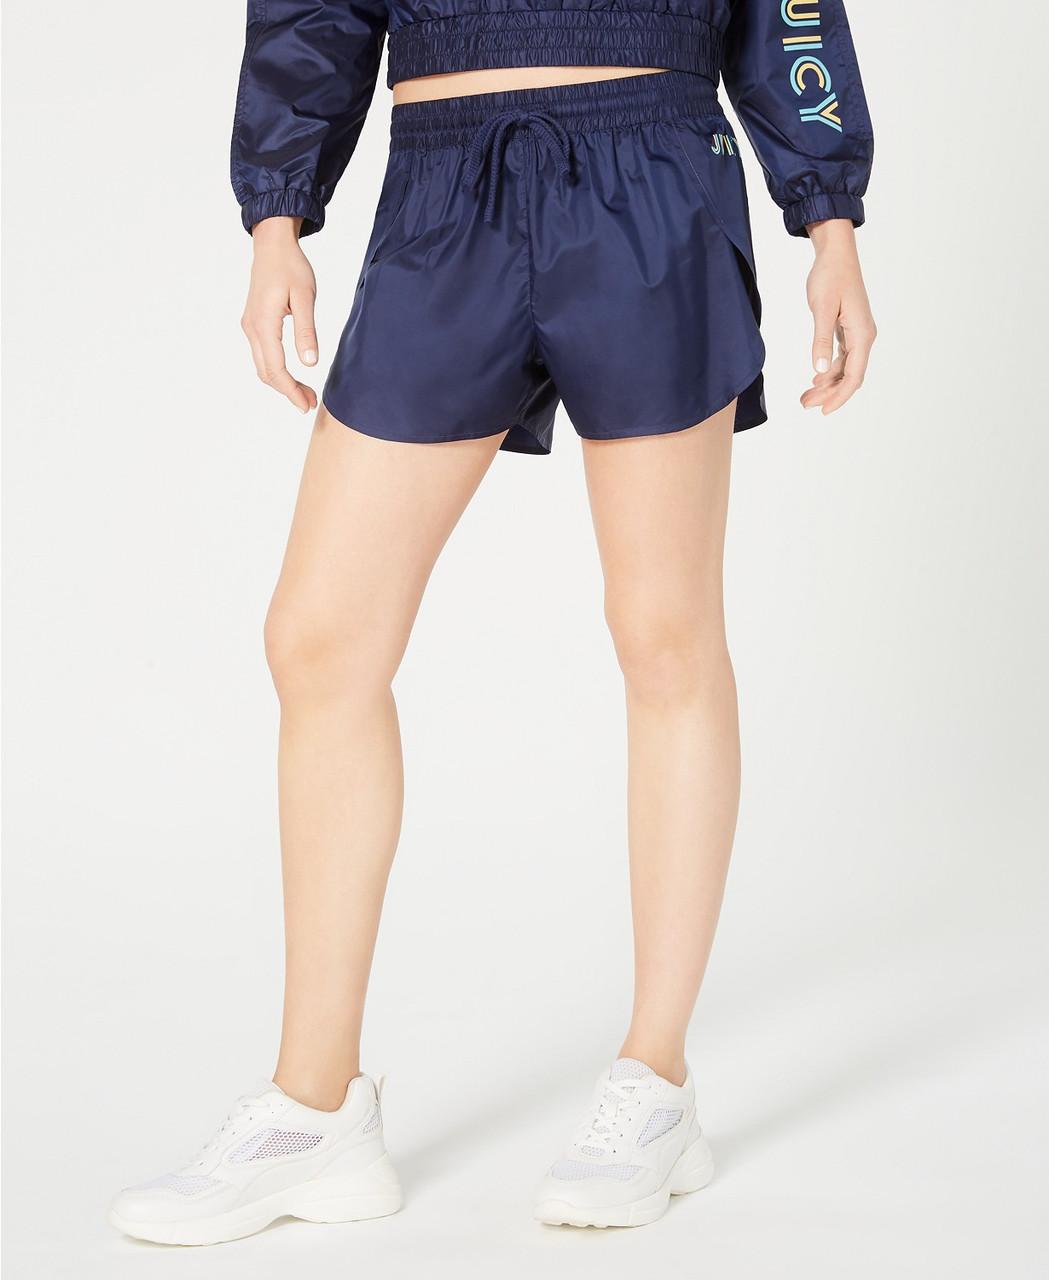 Juicy Couture Женские шорты - Е2